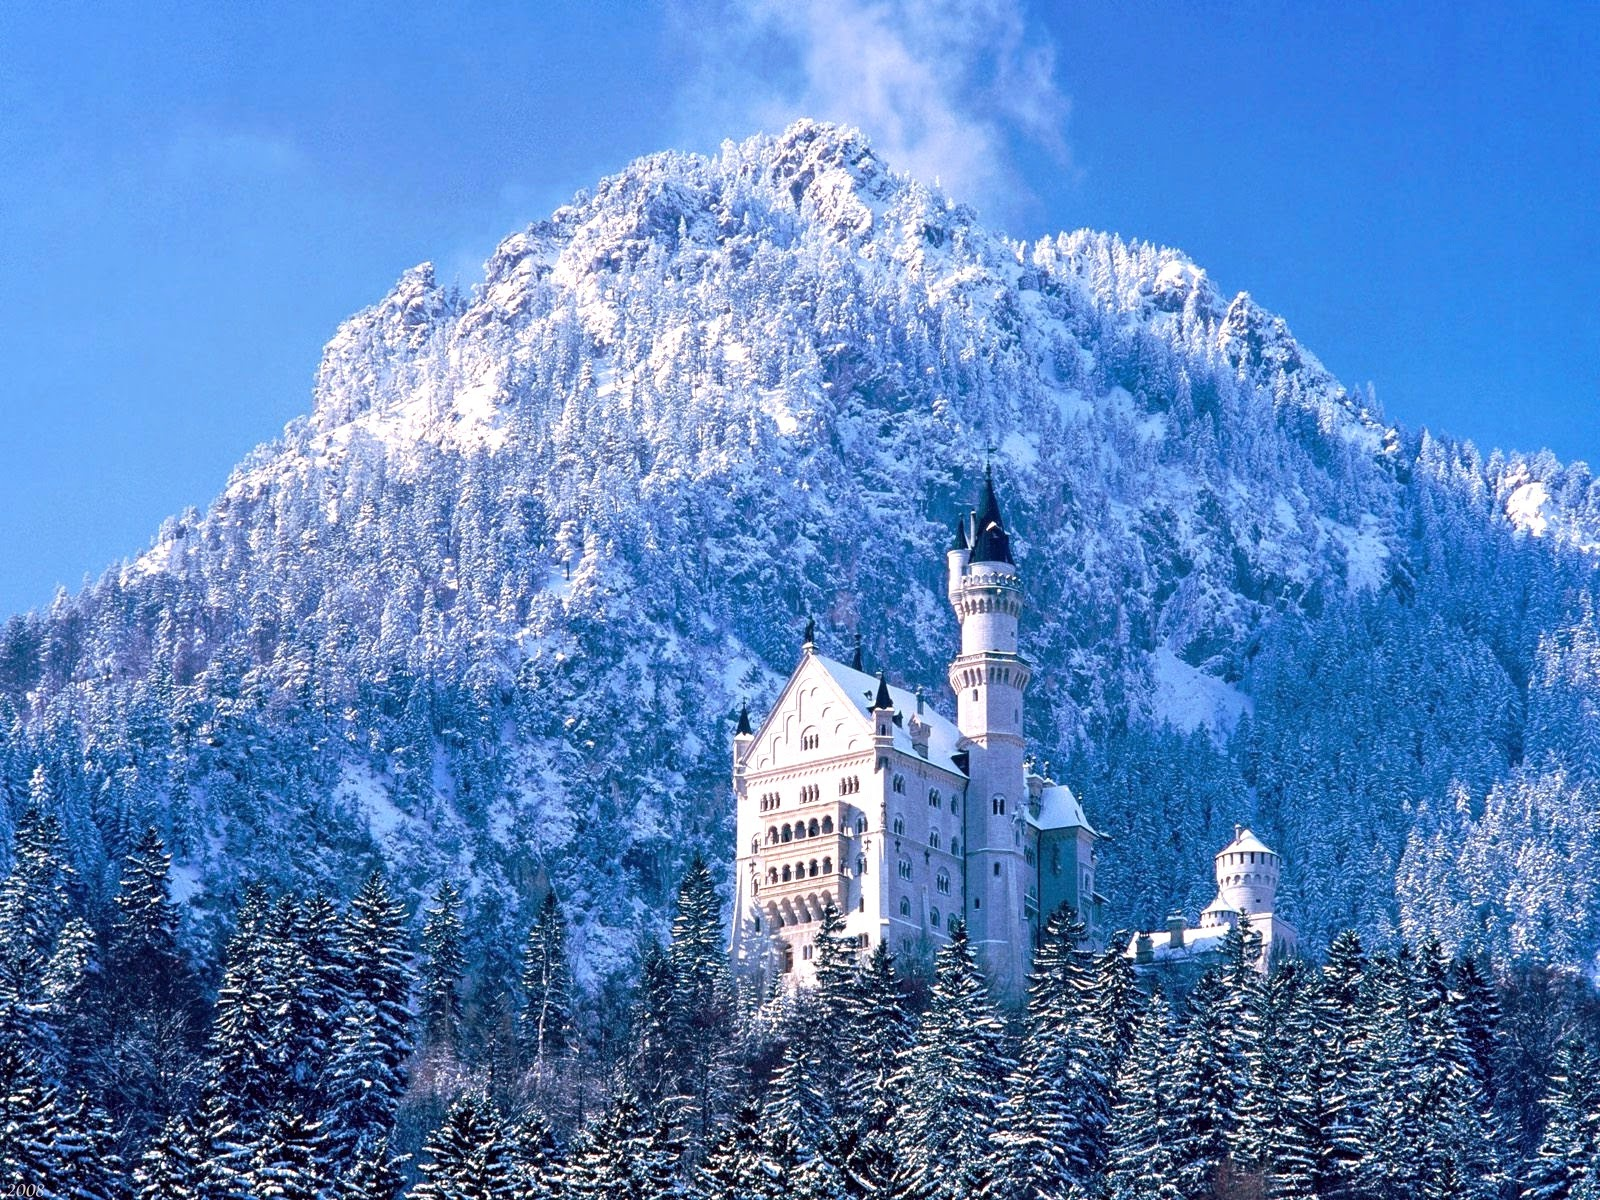 Pemandangan Salju Pemandangan Dunia Yang Cantik Dan Indah